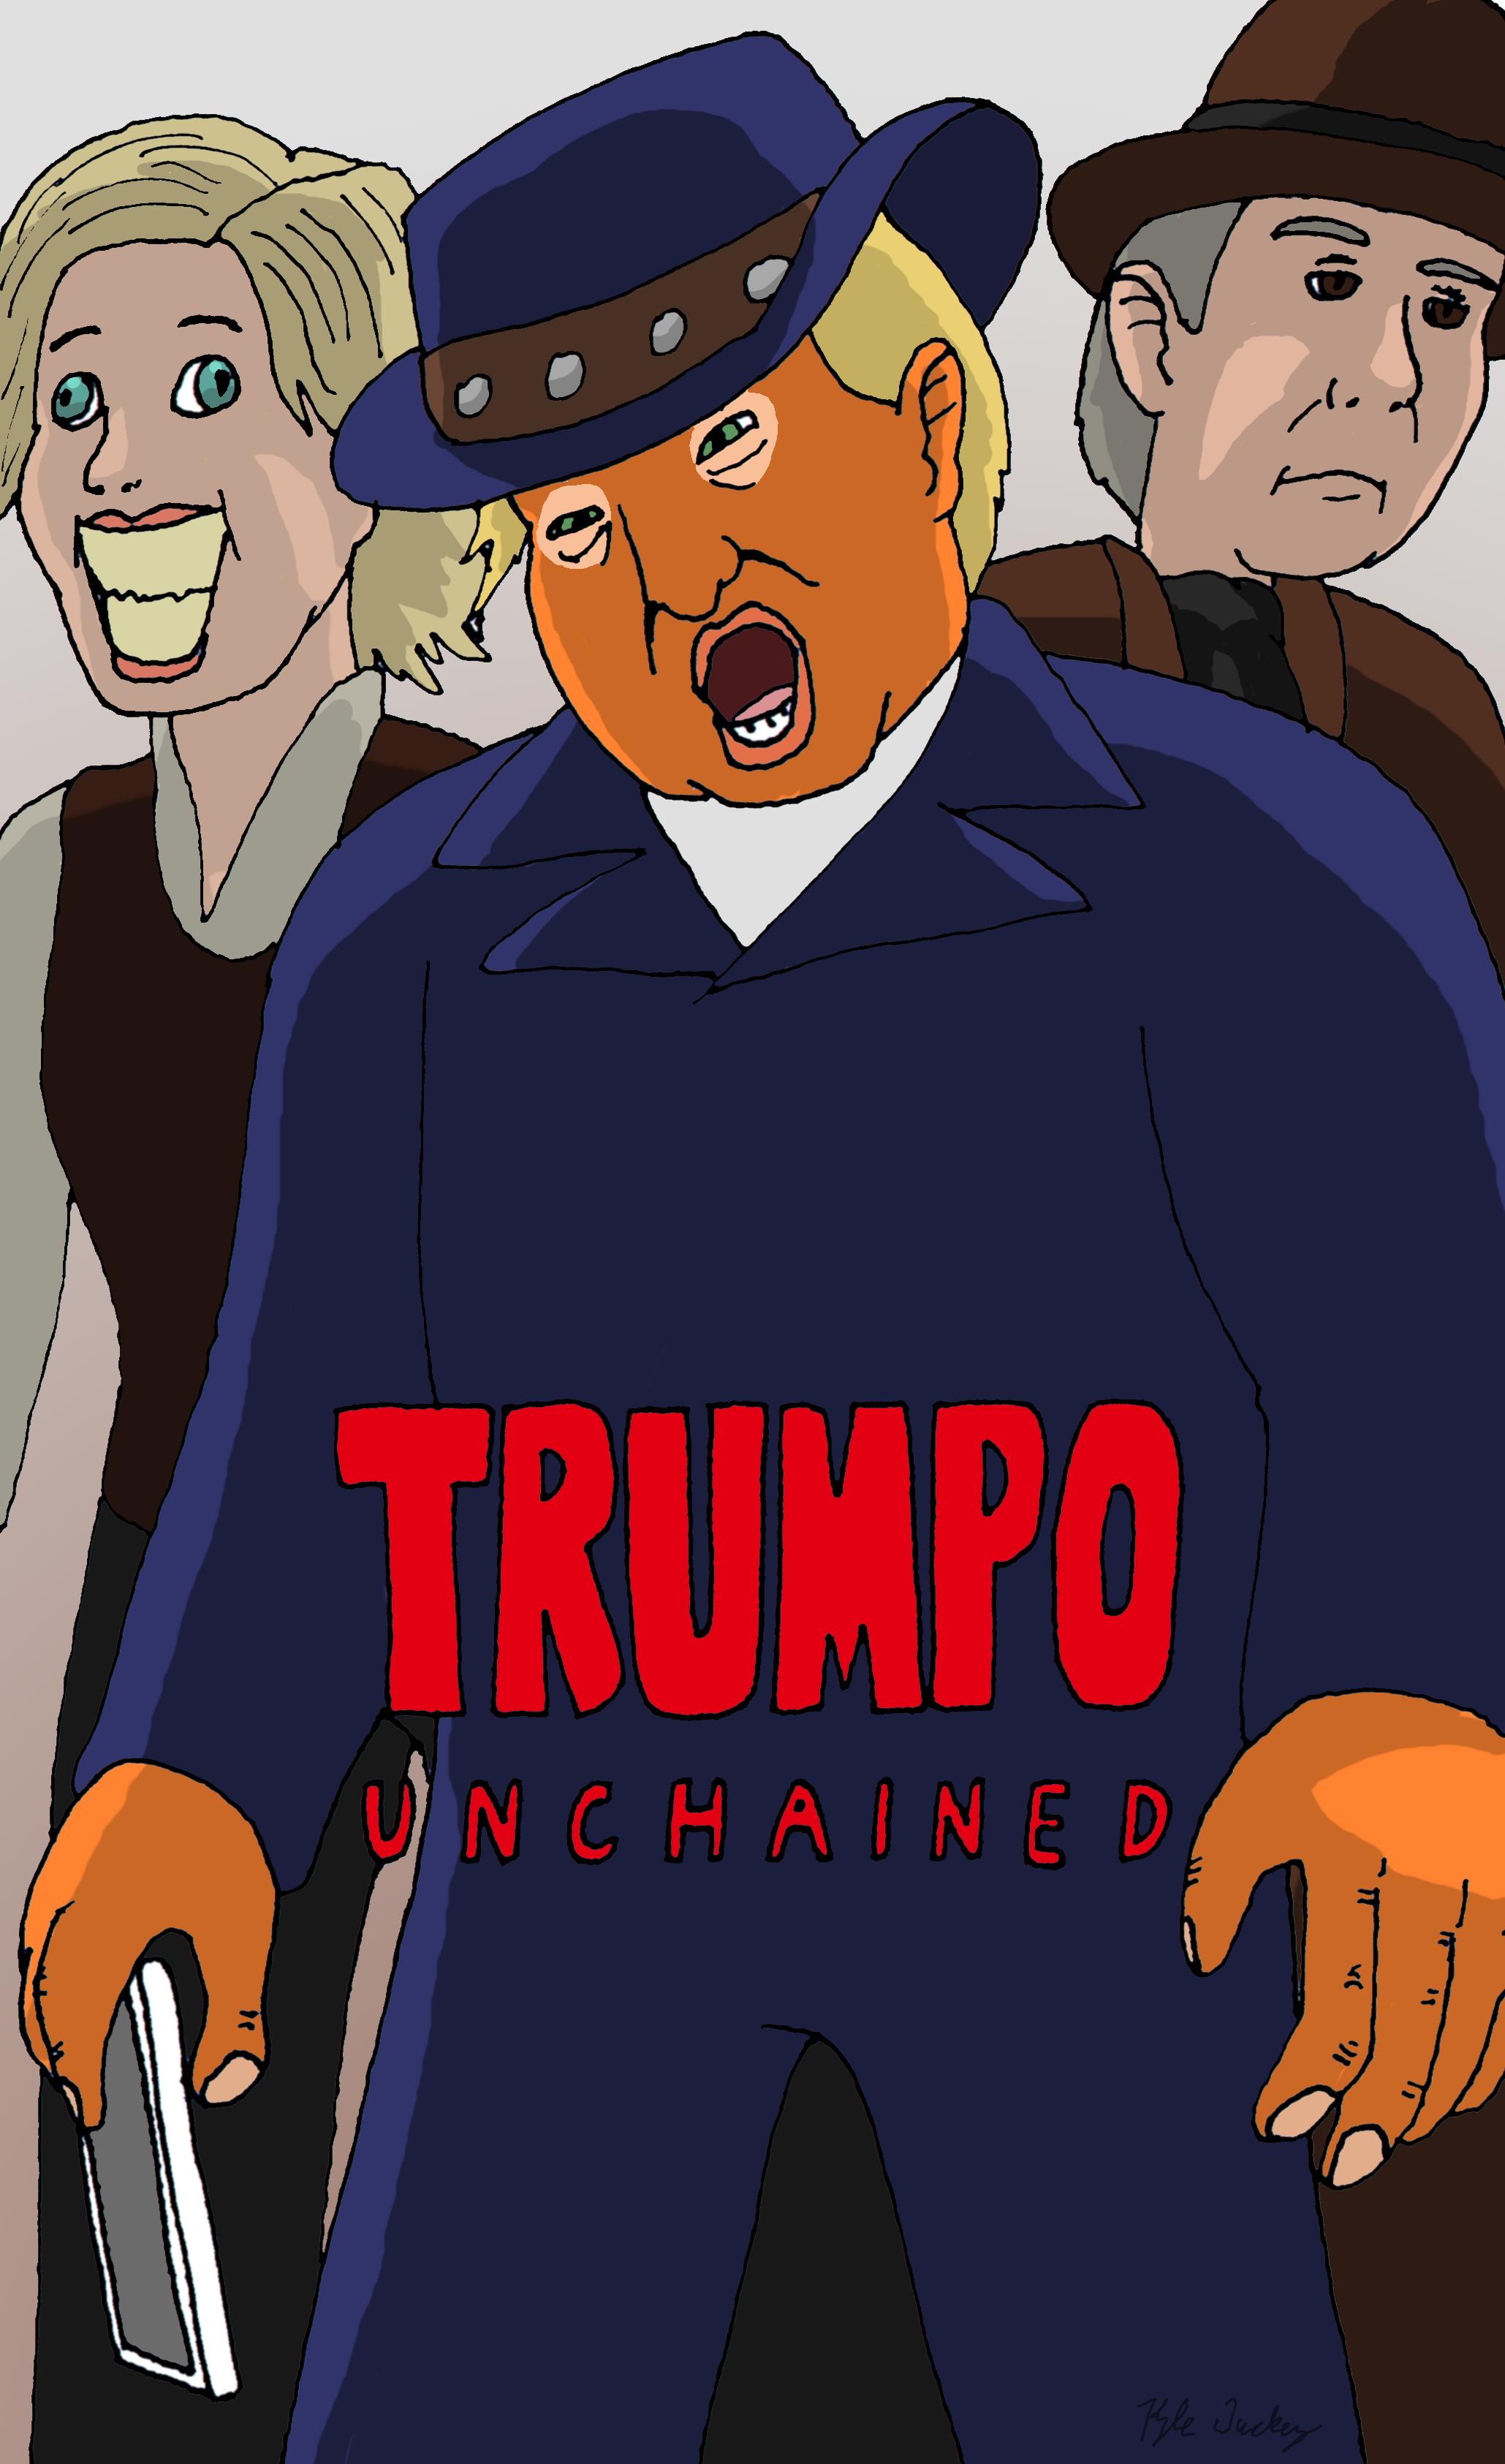 Trumpo Unchained